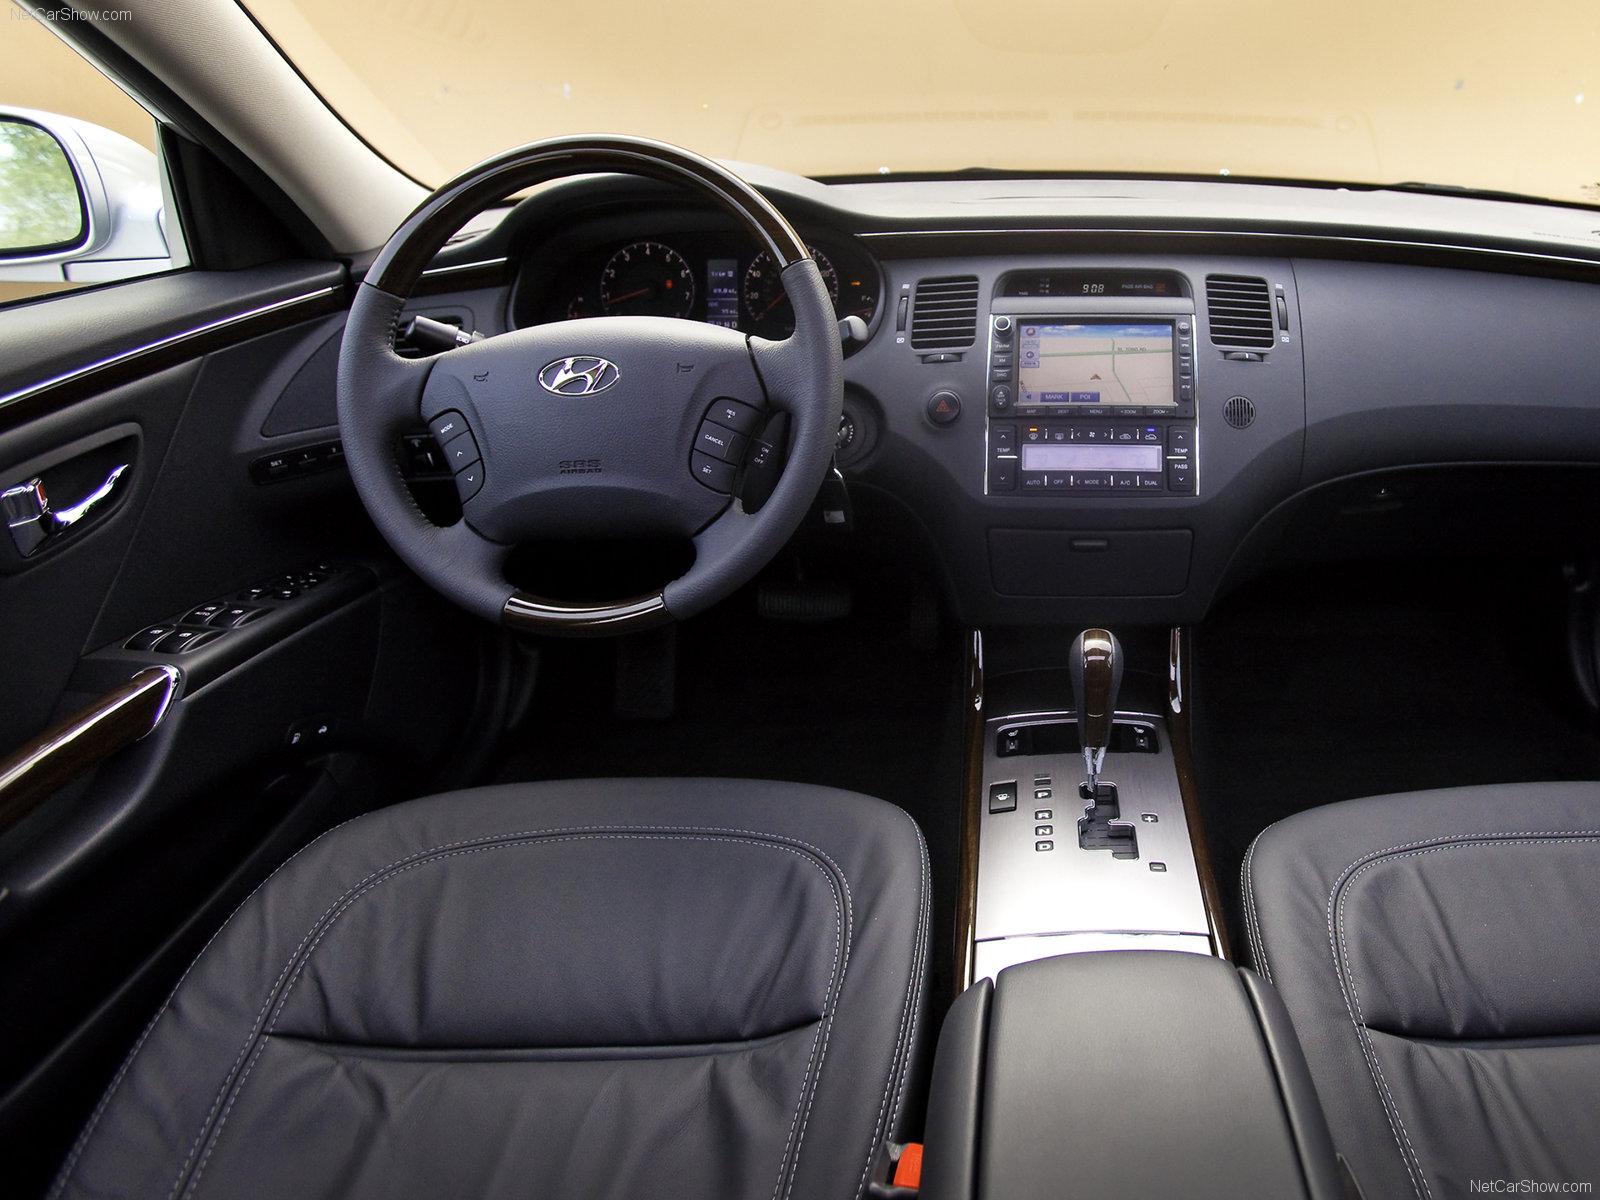 Sterling Mccall Gmc >> Hub Hyundai Of Katy Hyundai Katy Hyundai Houston .html | Autos Post